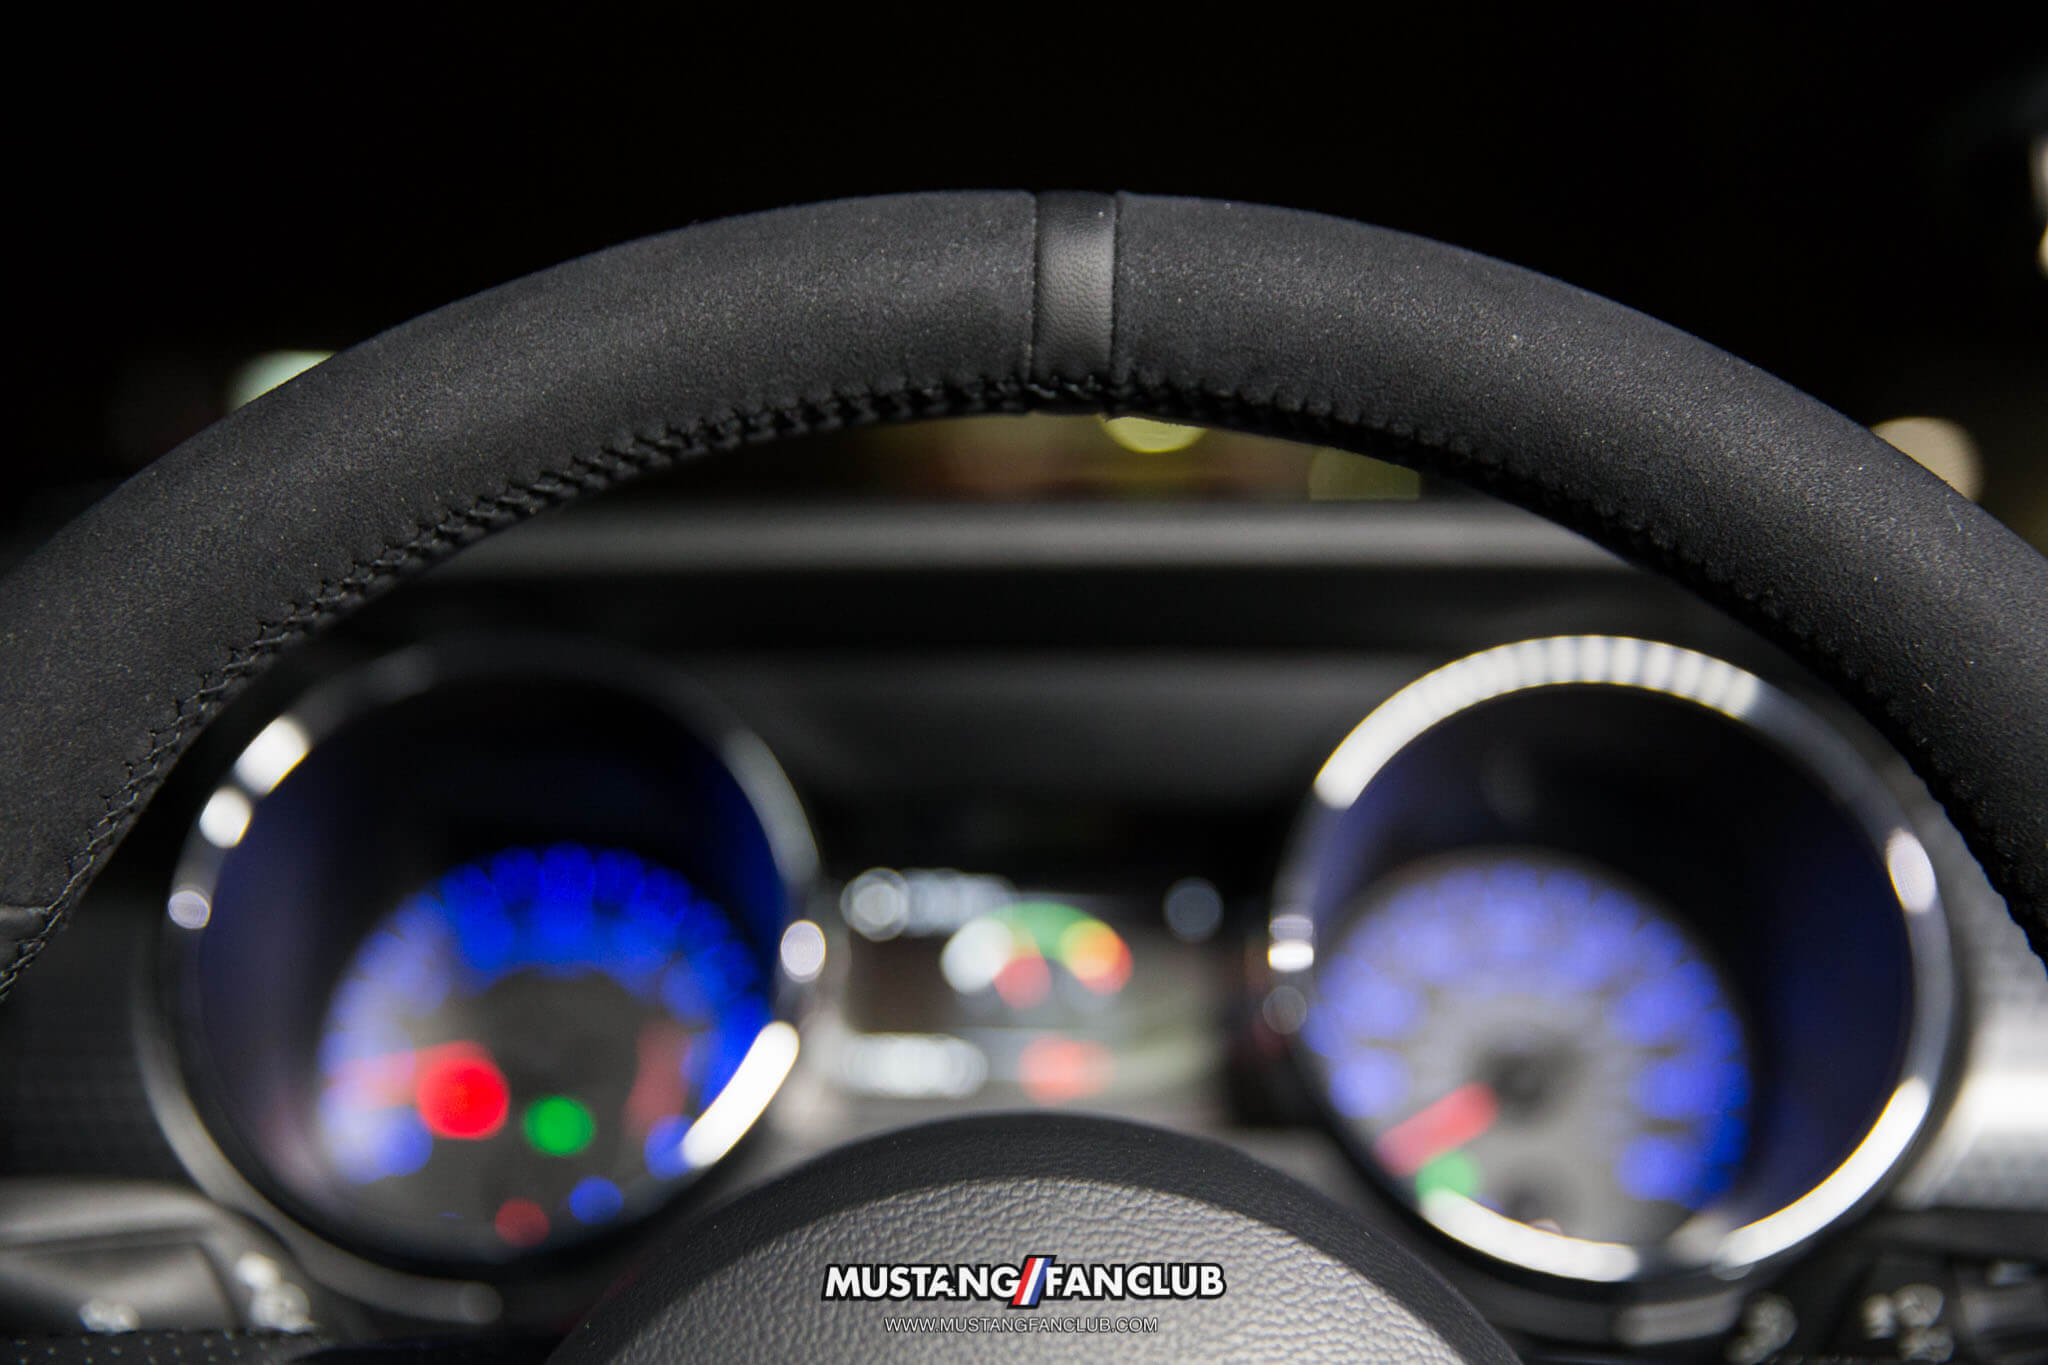 LMR LMR.com Latemodelrestoration latemodelresto steering wheel x550 s550 mustangfanclub mustang fan club suede alcantara leather